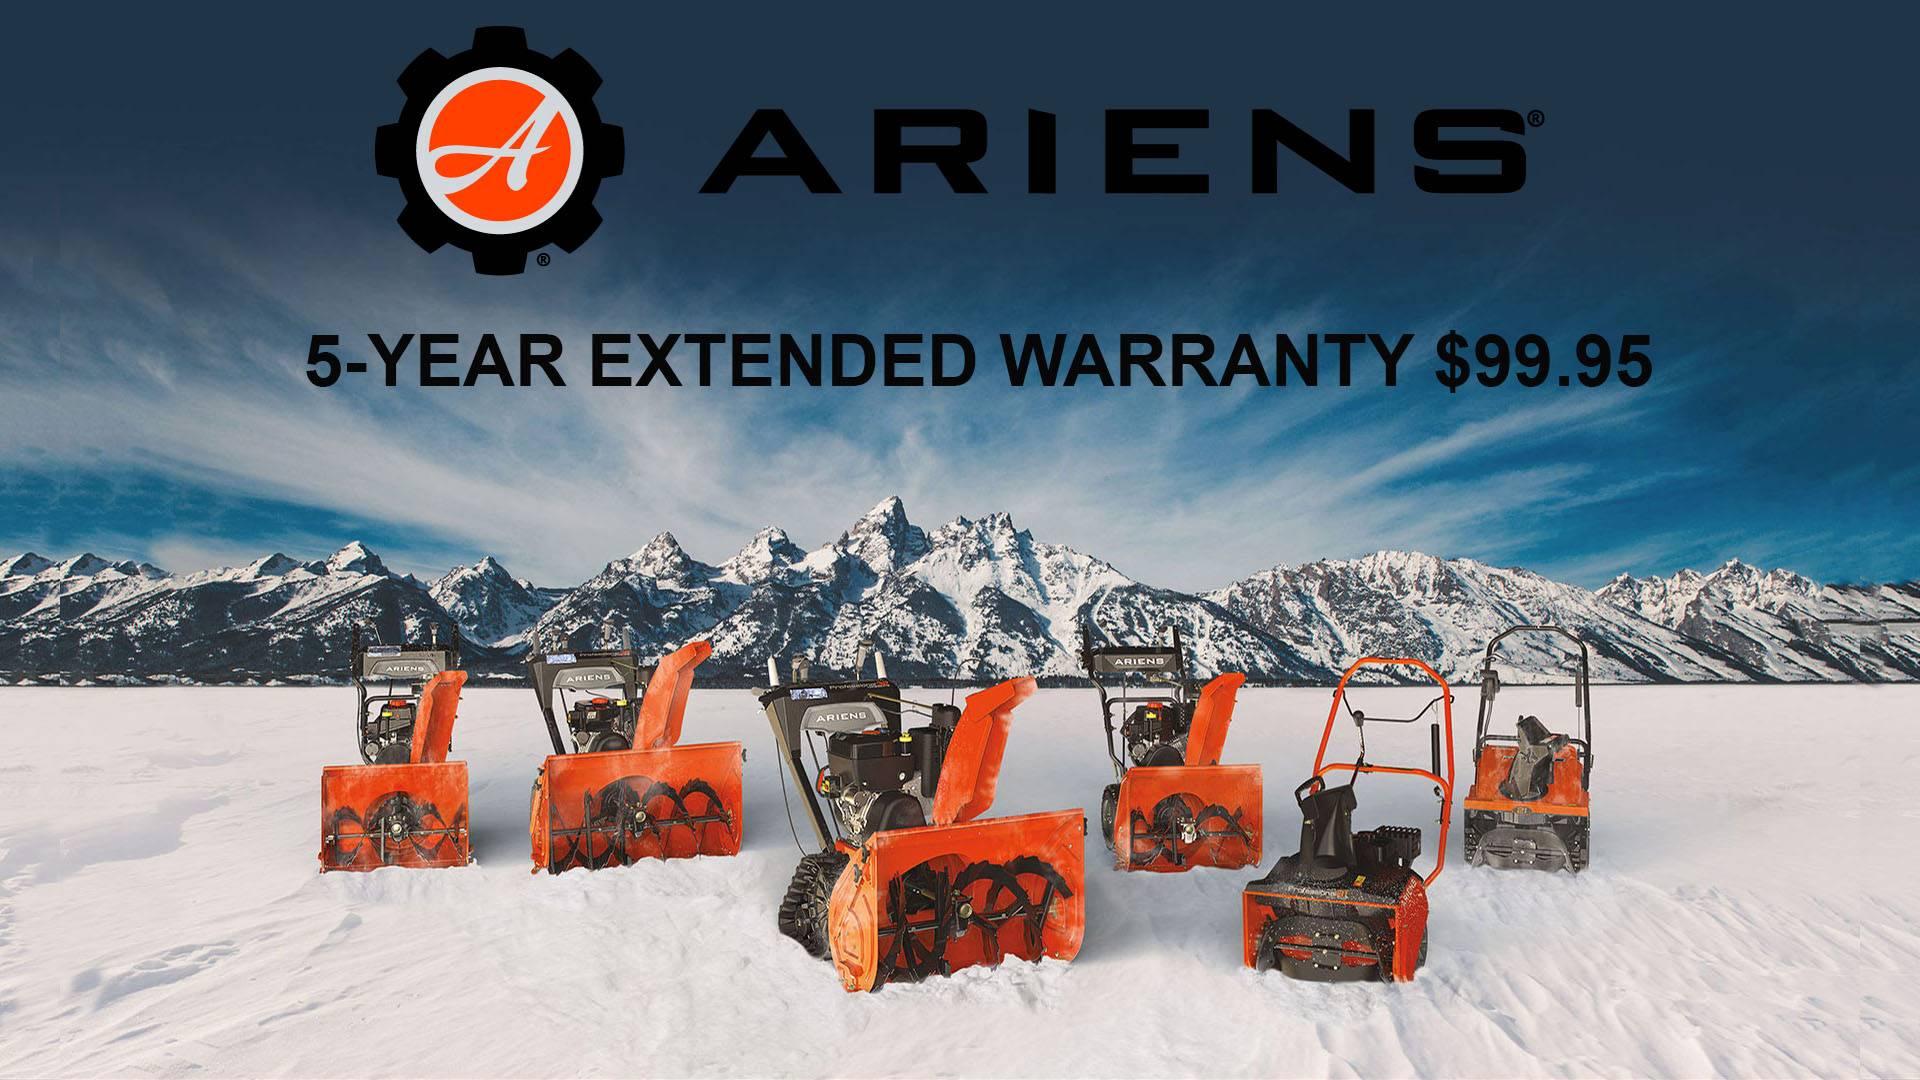 Ariens - 5-Year Extended Warranty $99.95